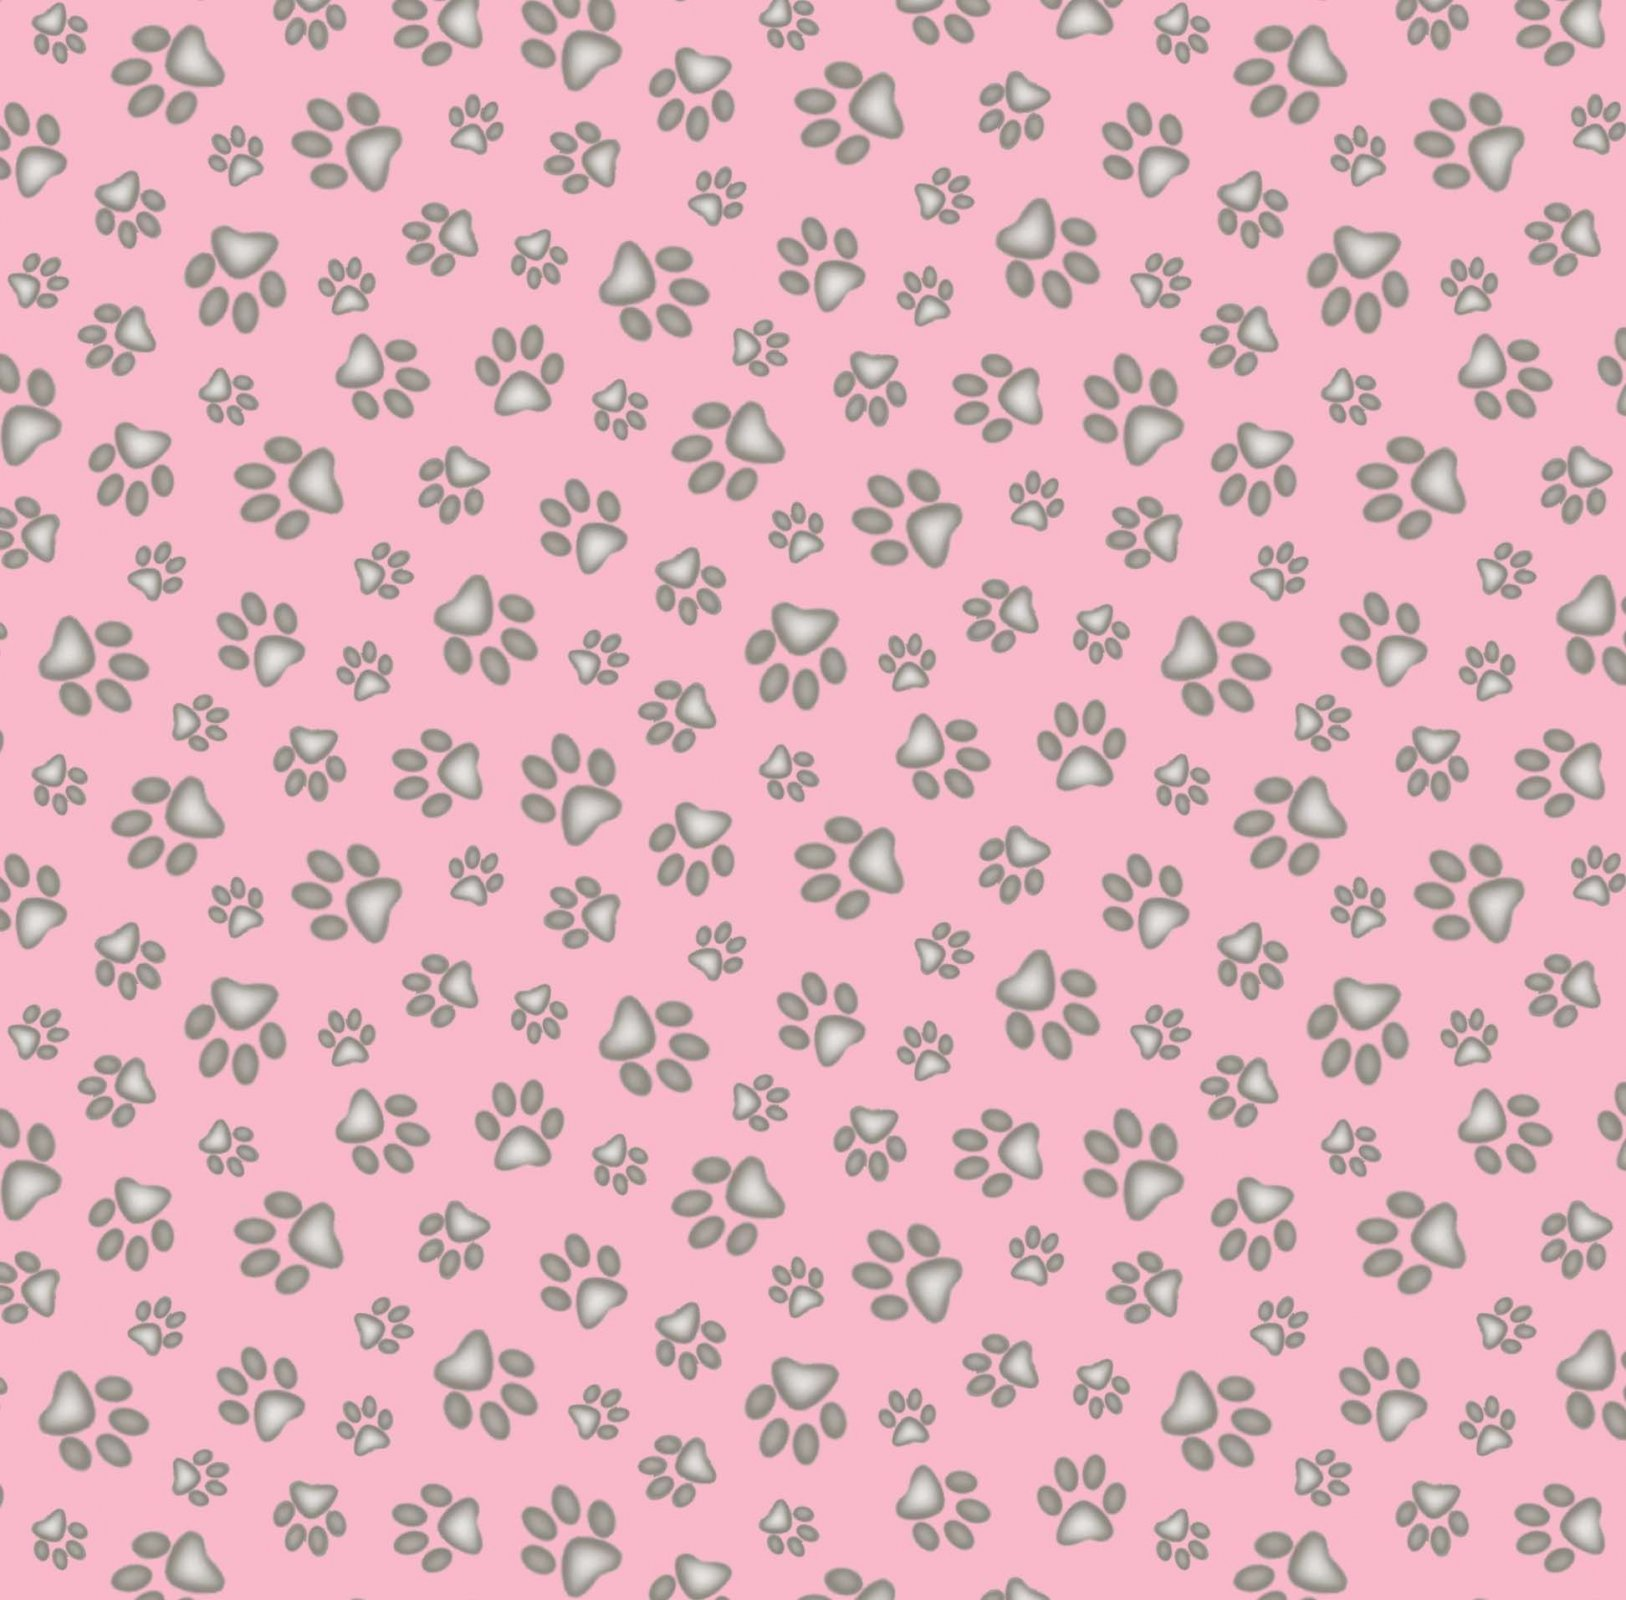 ES-Best Friend 181 Pink - Paw Print